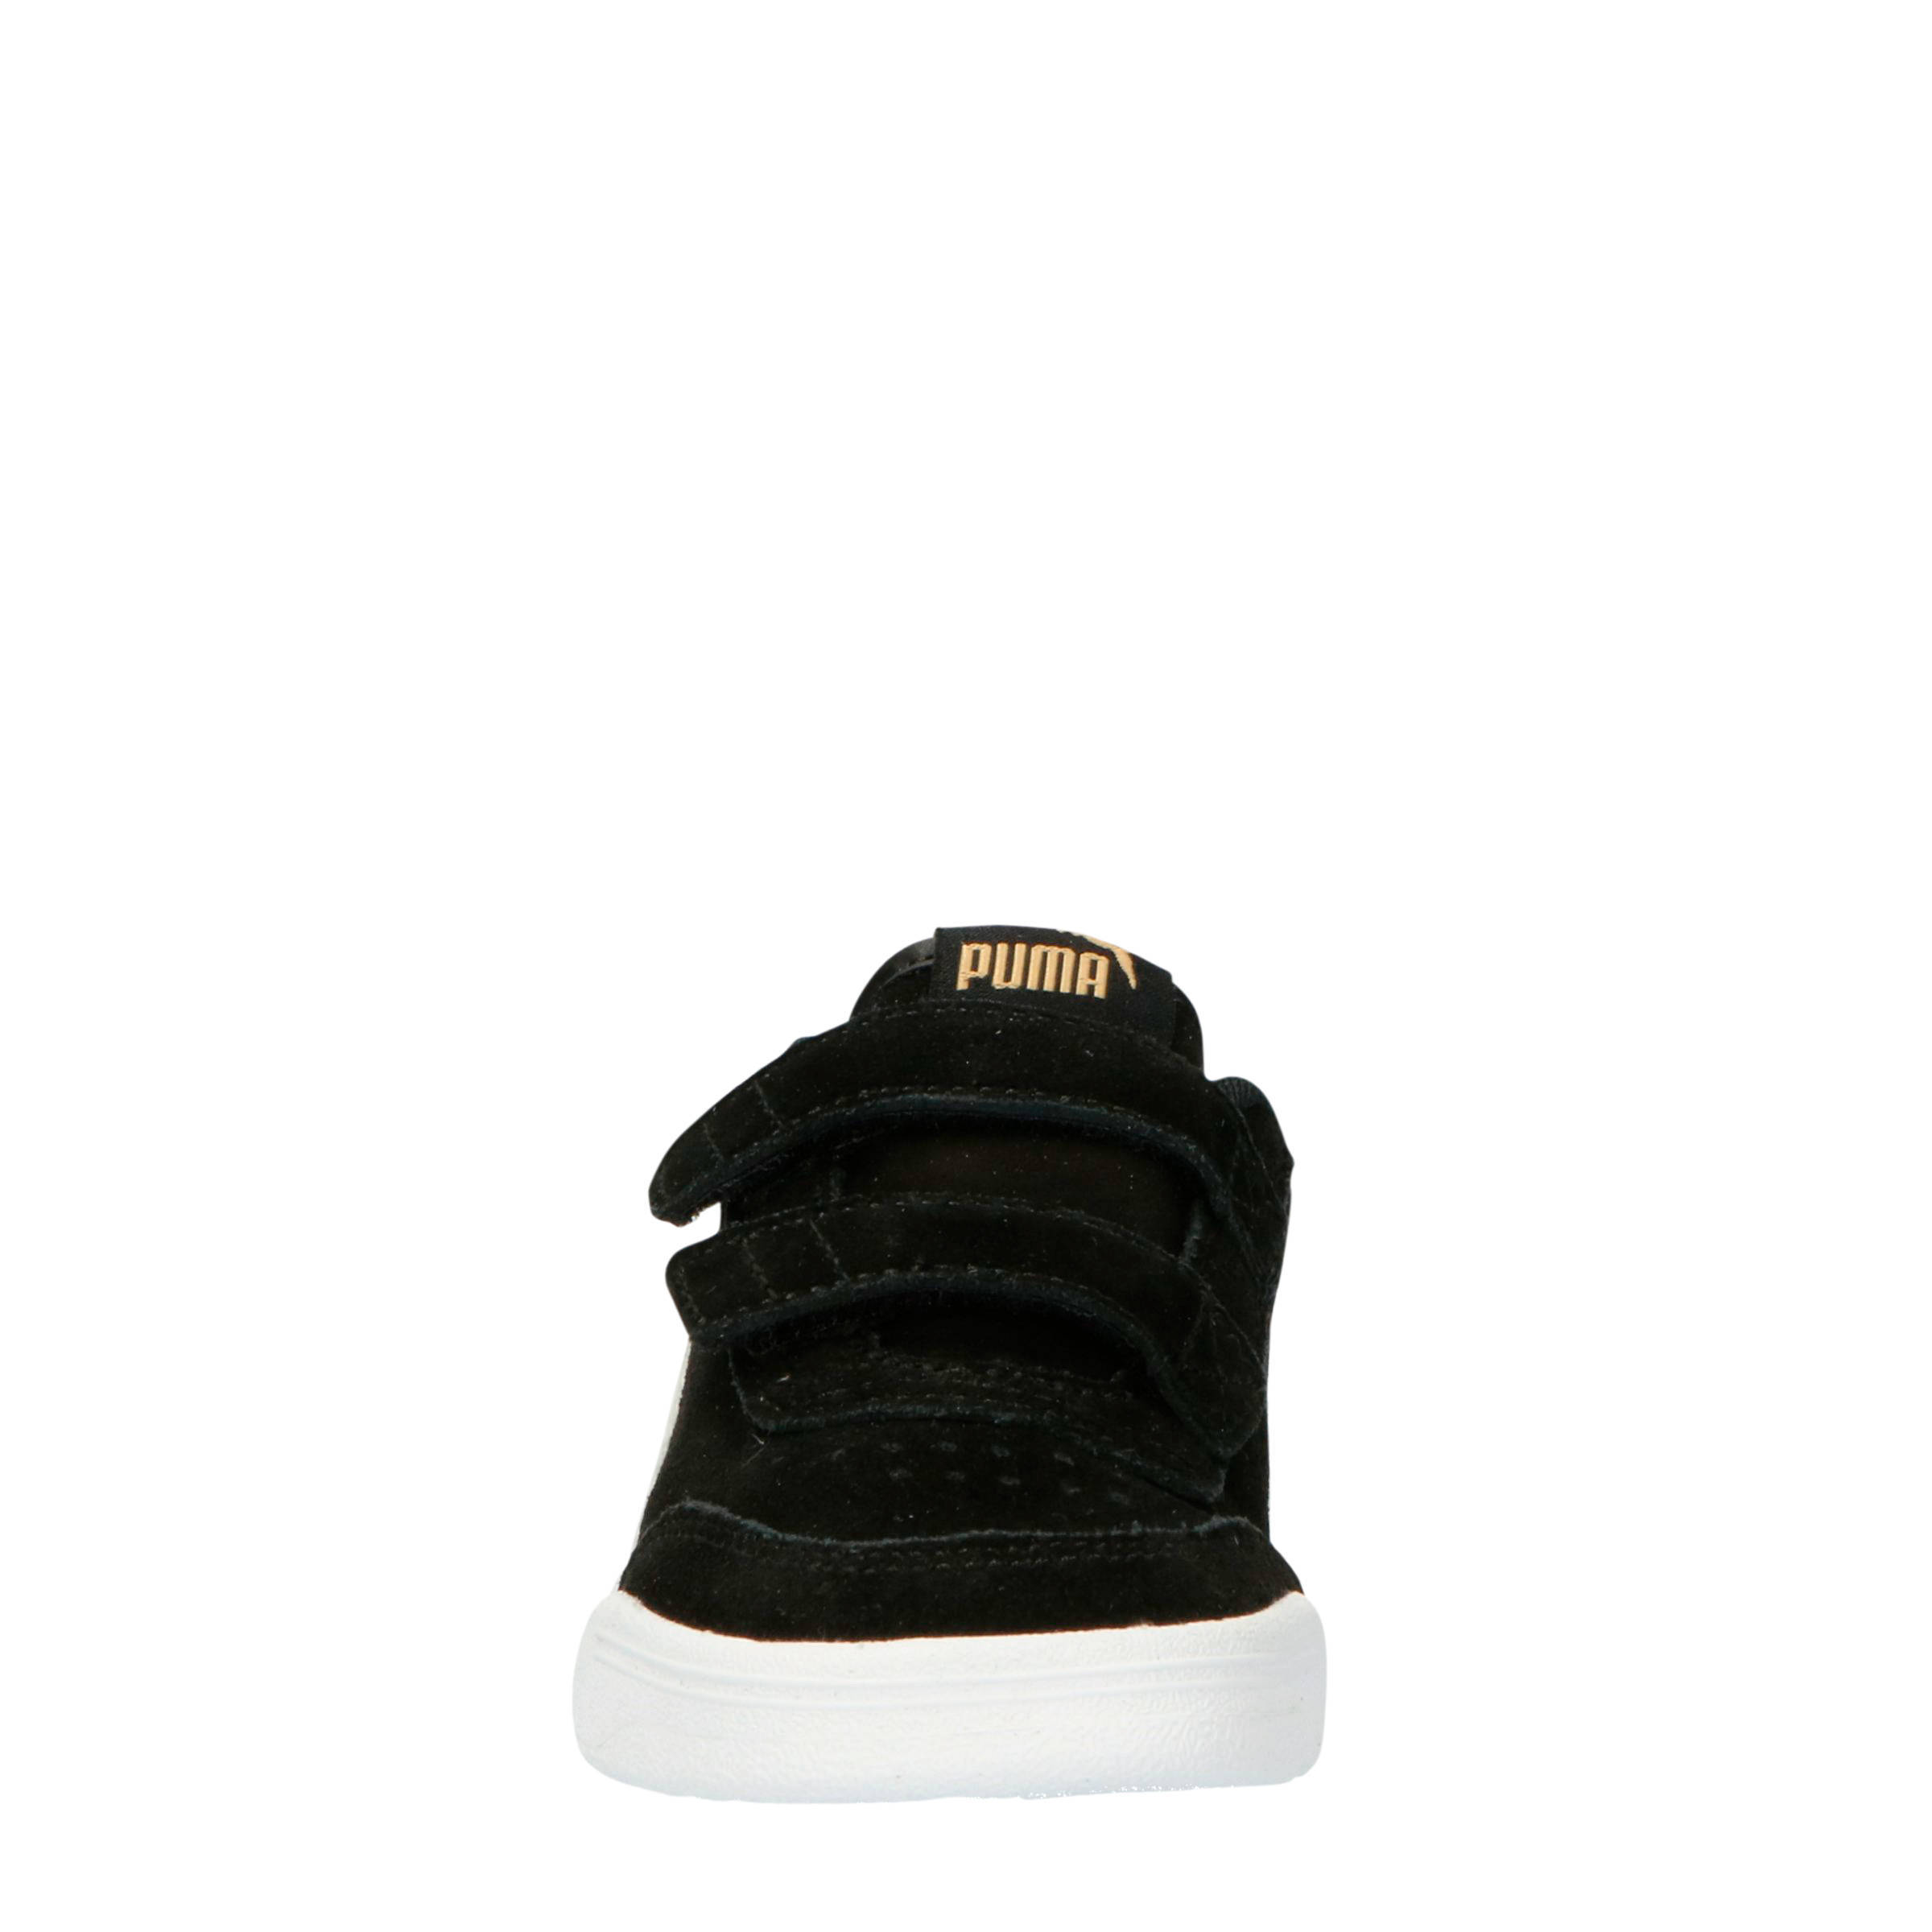 Puma Caracal SD V Inf sneakers zwartwit | wehkamp